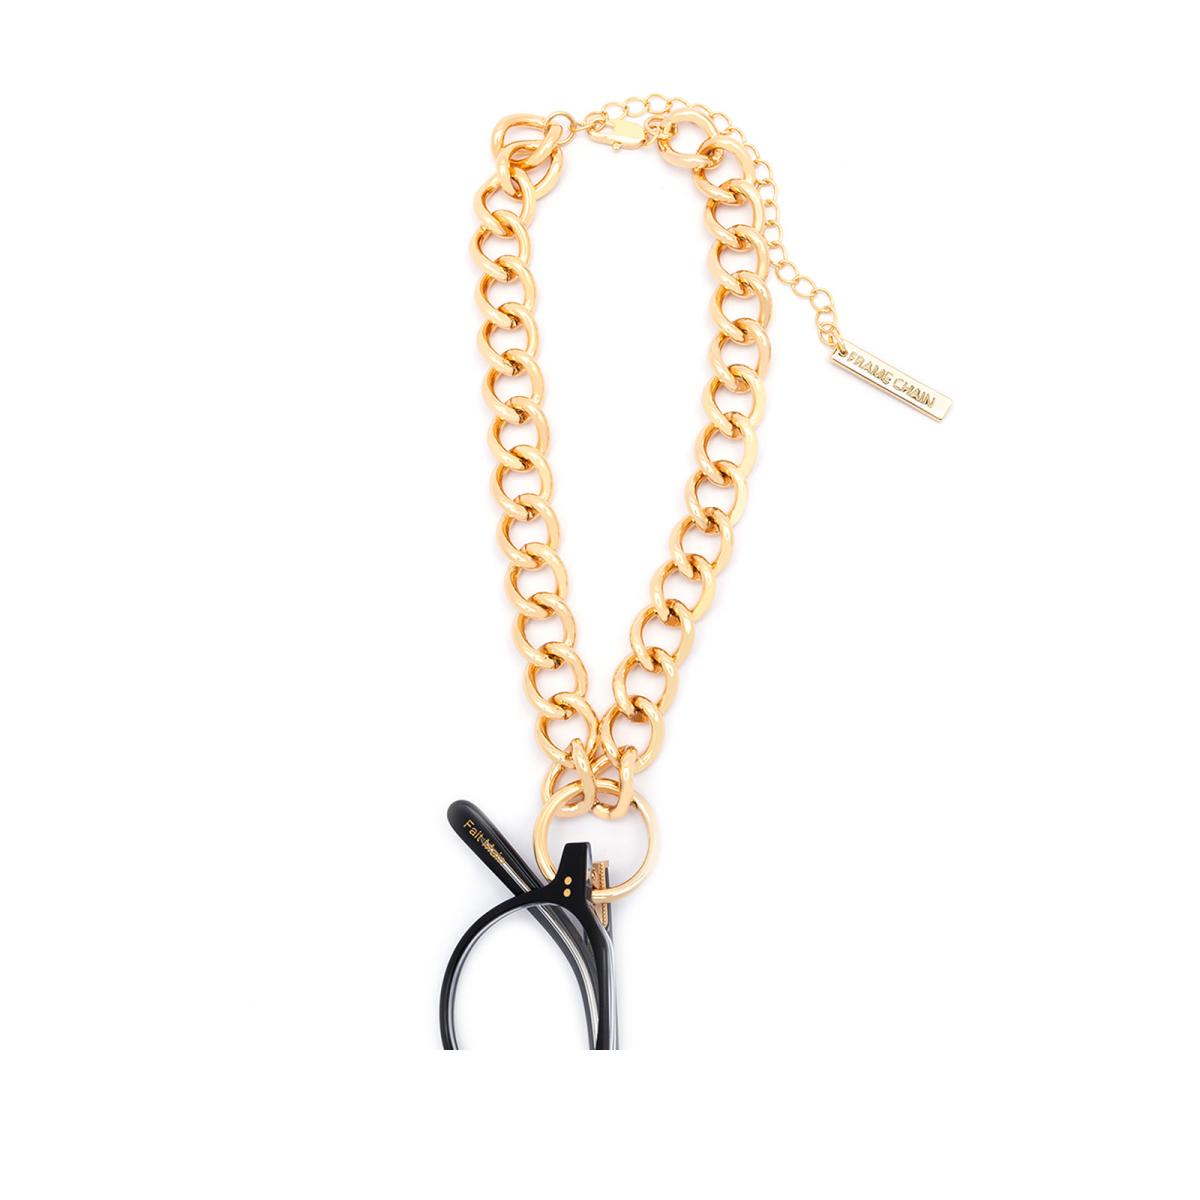 Frame Chain HOOKER DIAMOND YELLOW GOLD  (2)